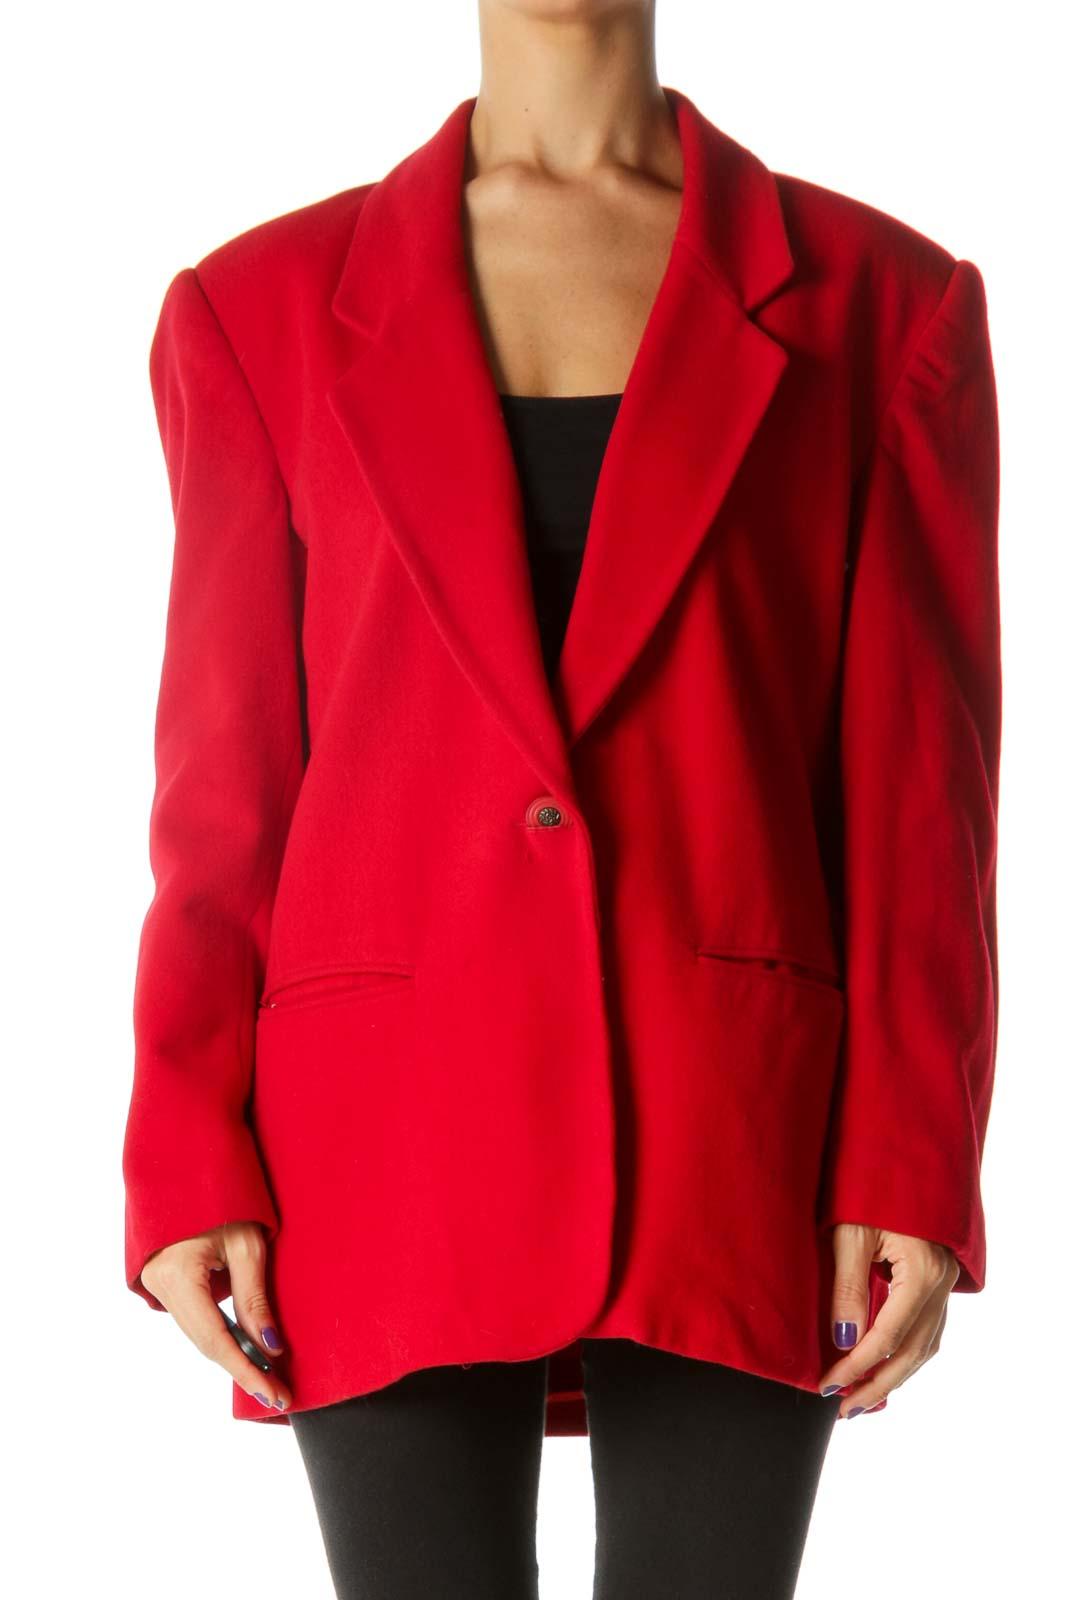 Red Wool Blend Padded Shoulders Pocketed Jacket Front